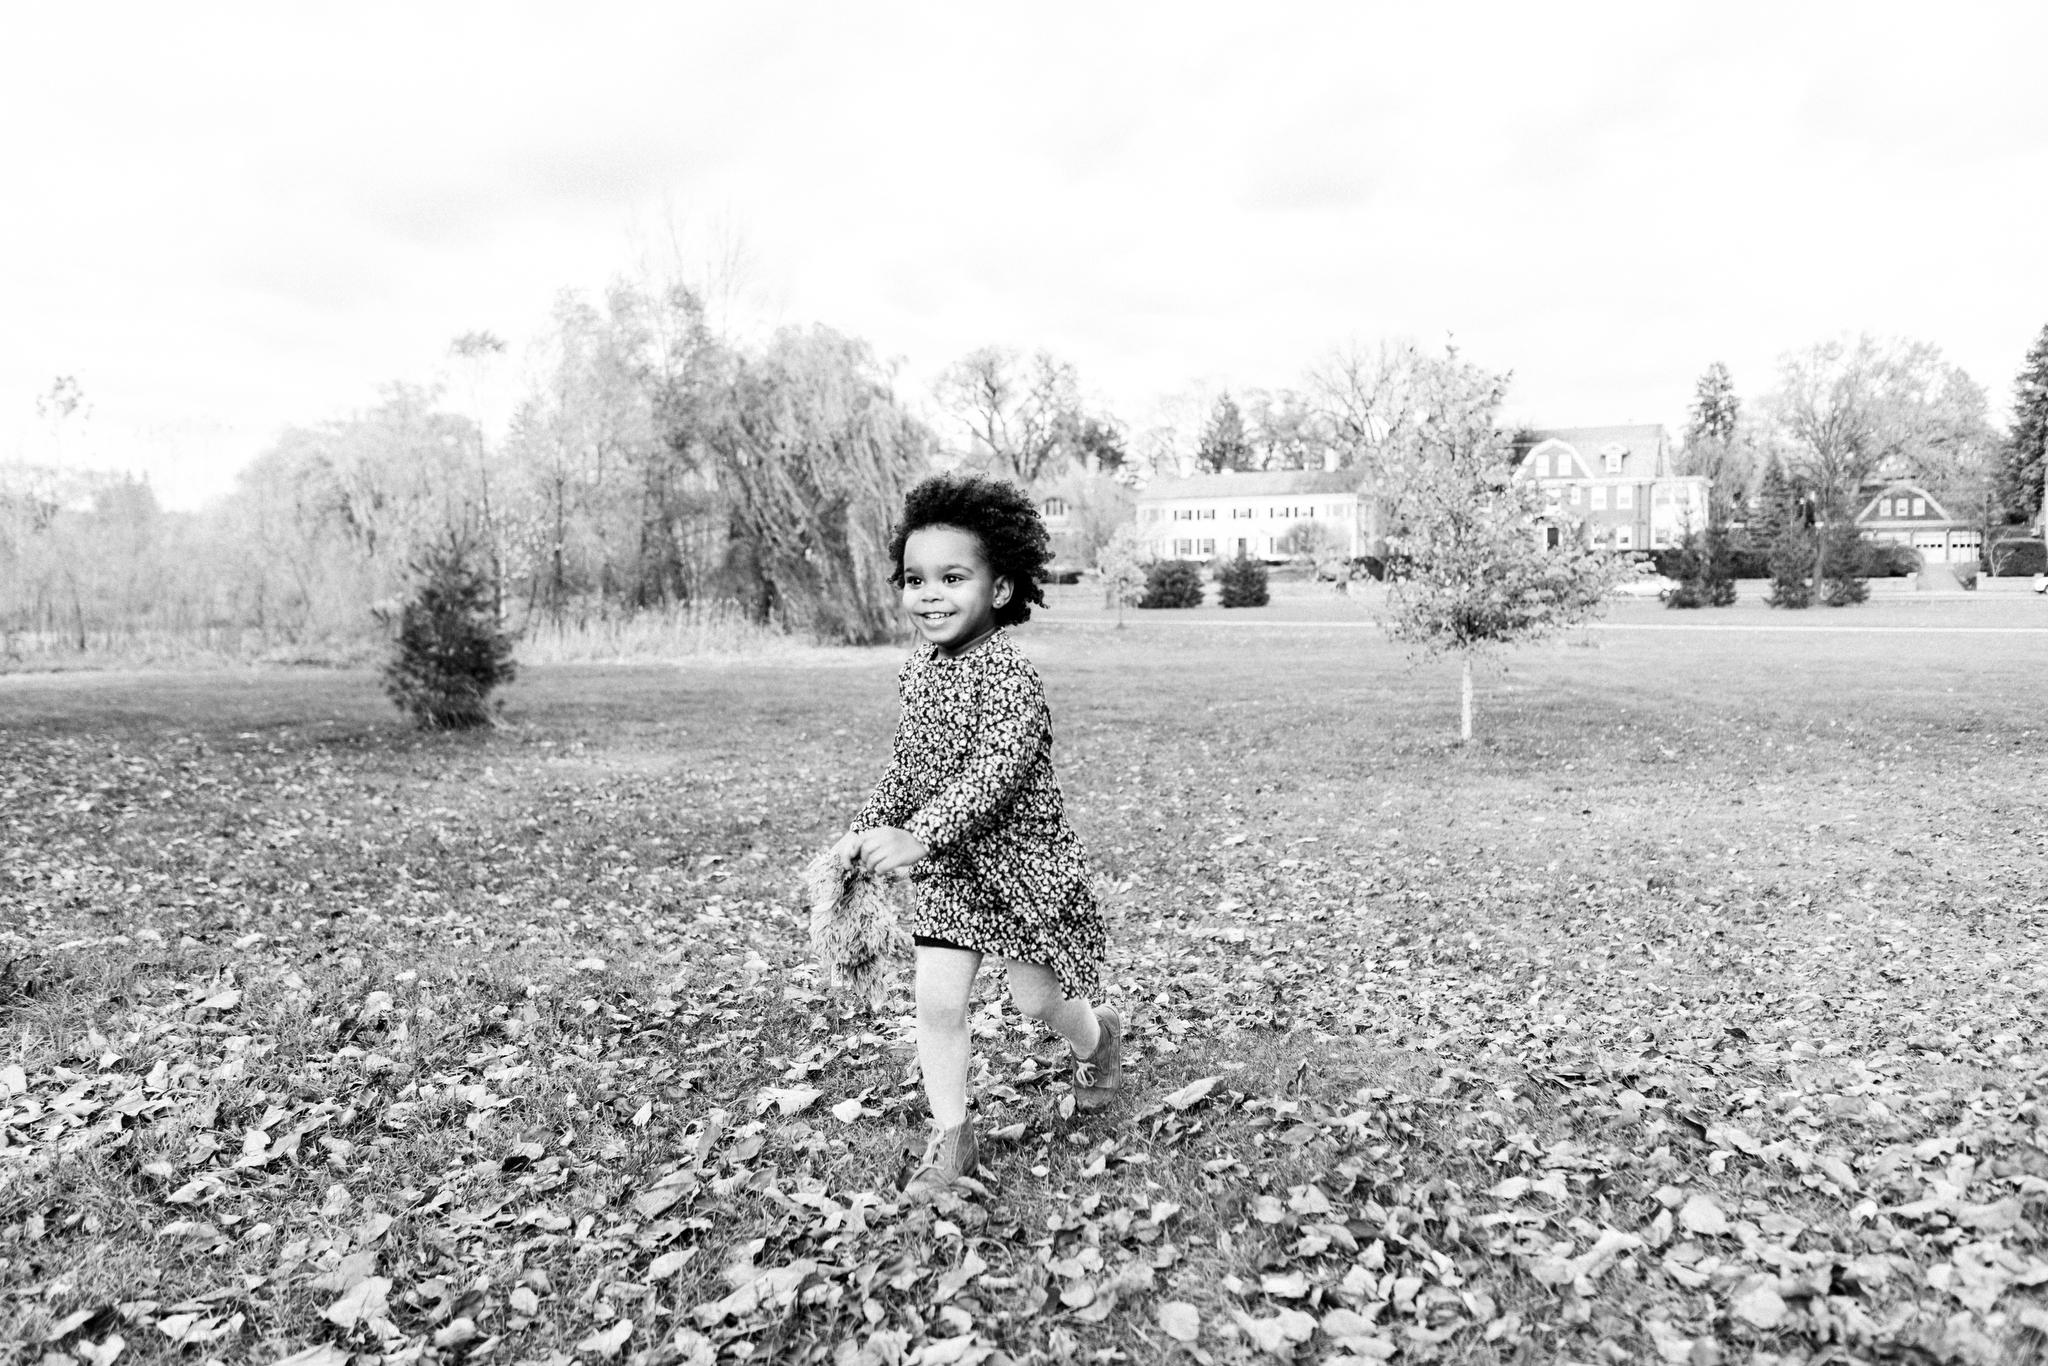 Children's Portrait Photography by Lake Harriet in Minneapolis